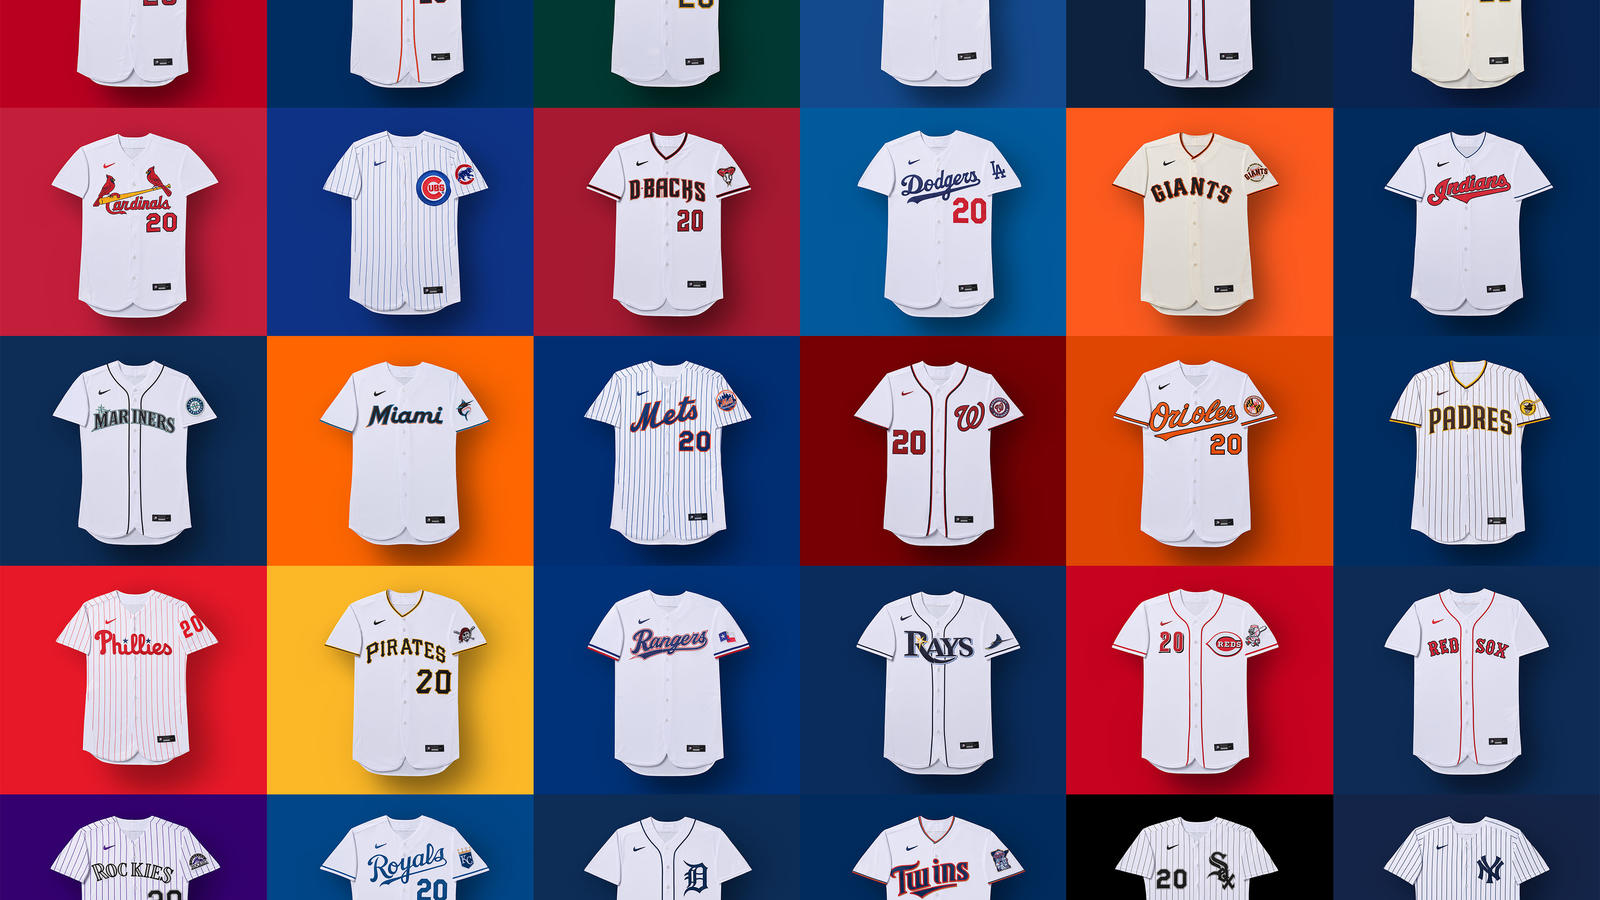 nike-x-major-league-baseball-uniforms-2020-official-images